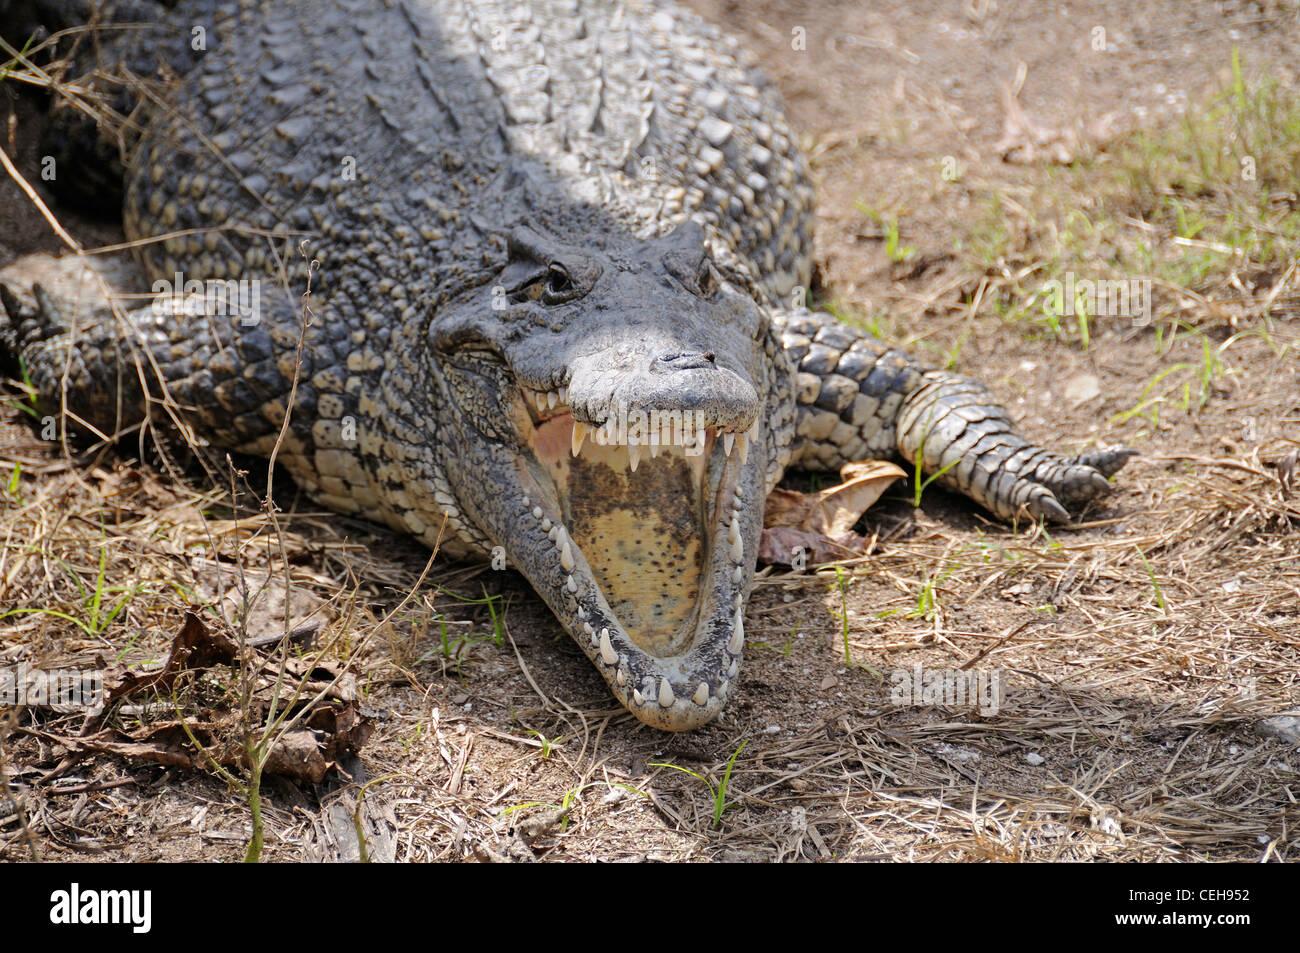 Kubanische Krokodil mit offenem Mund, Kuba, Caribbean Stockbild